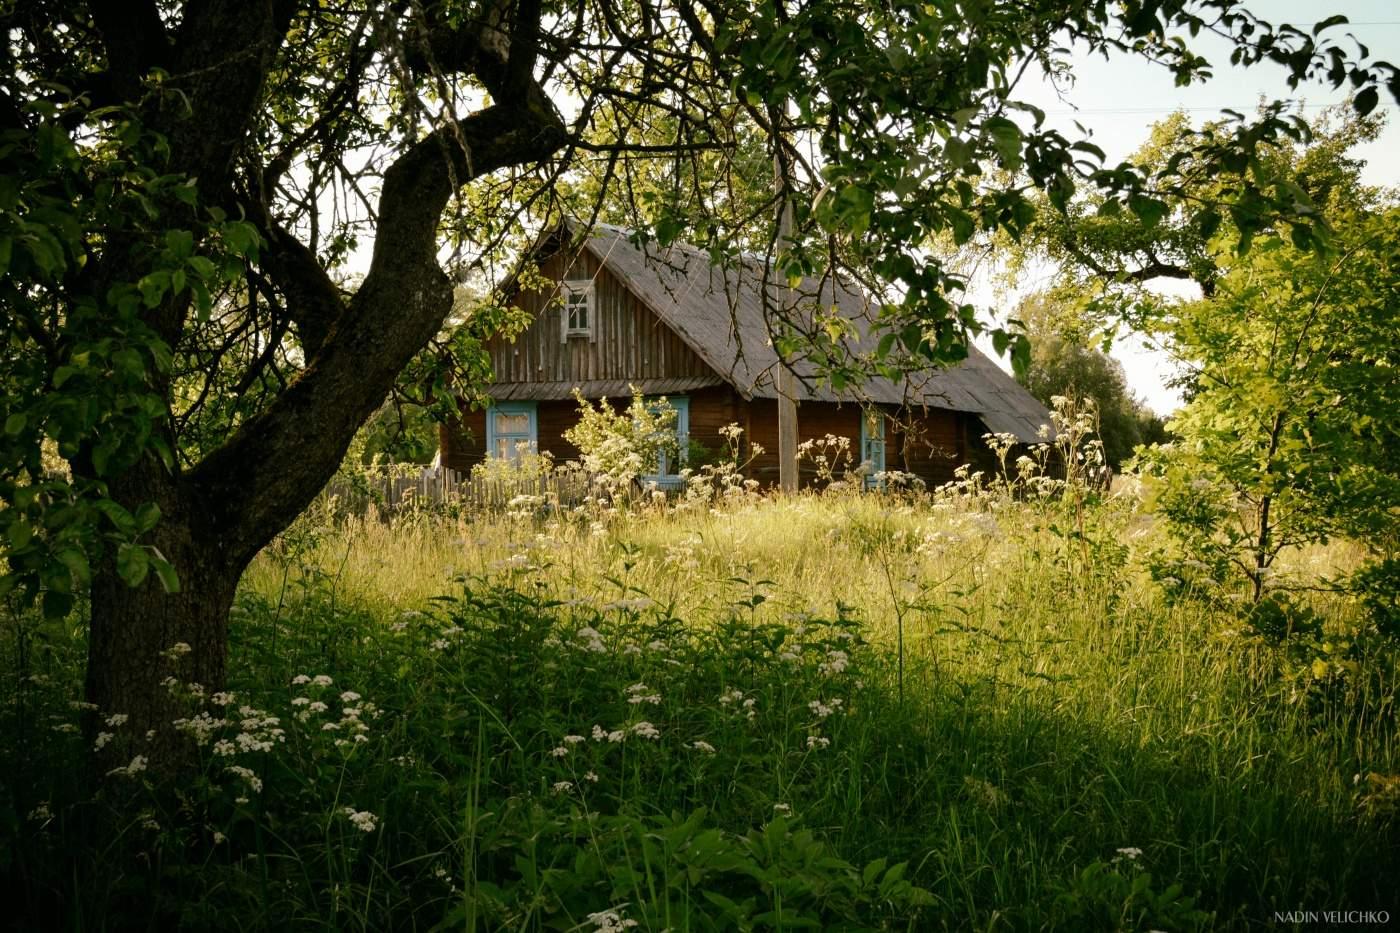 Картинки с деревенскими домами